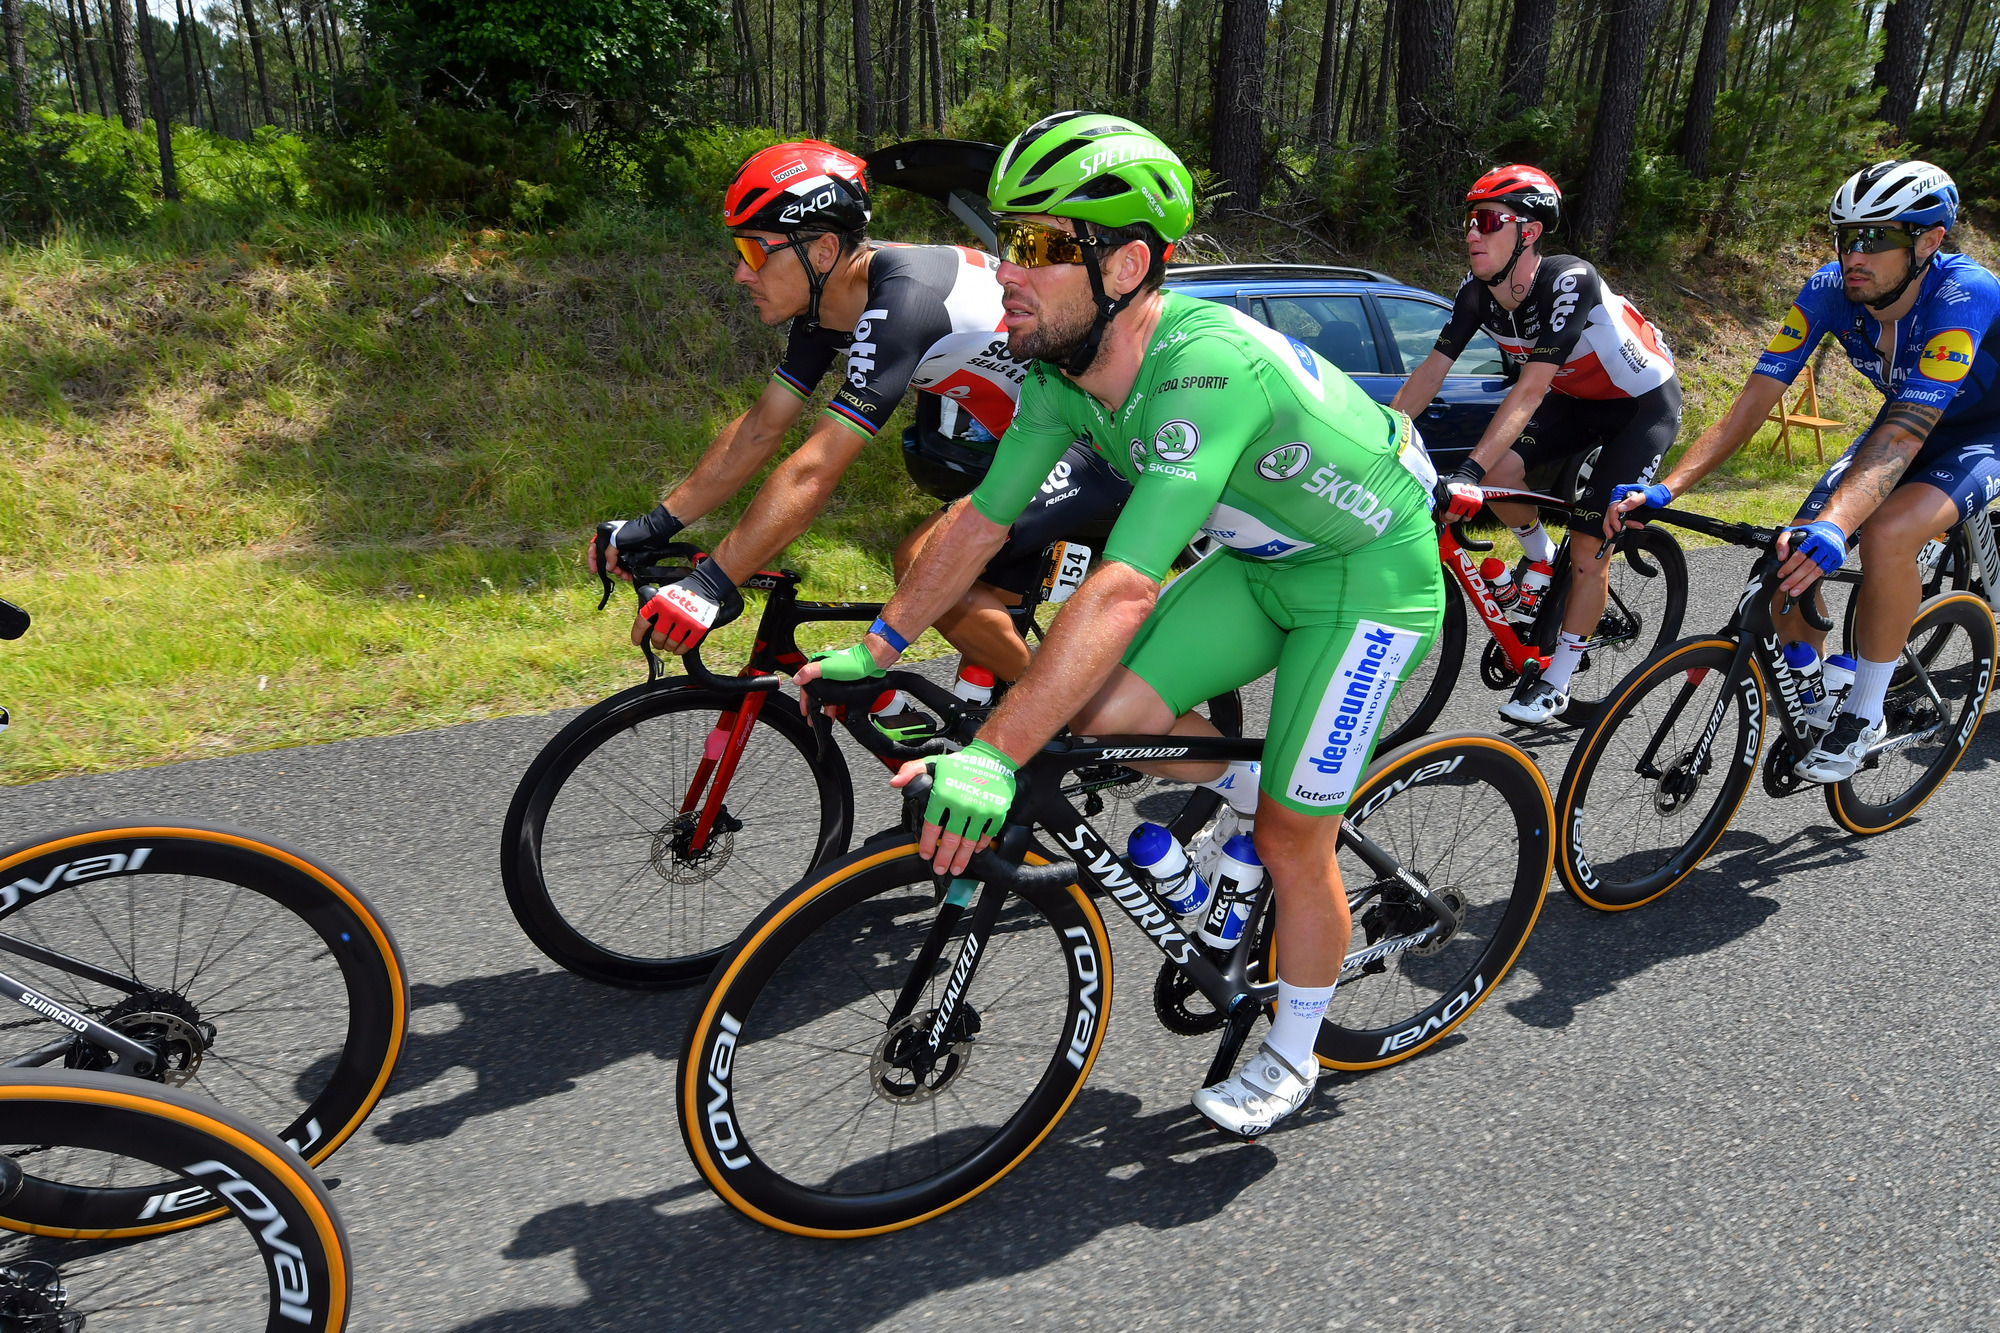 Tour de France 2021 - 108th Edition - 19th stage Mourenx - Libourne 207 km - 16/07/2021 - Mark Cavendish (GBR - Deceuninck - Quick-Step) - photo Dario Belingheri/BettiniPhoto©2021